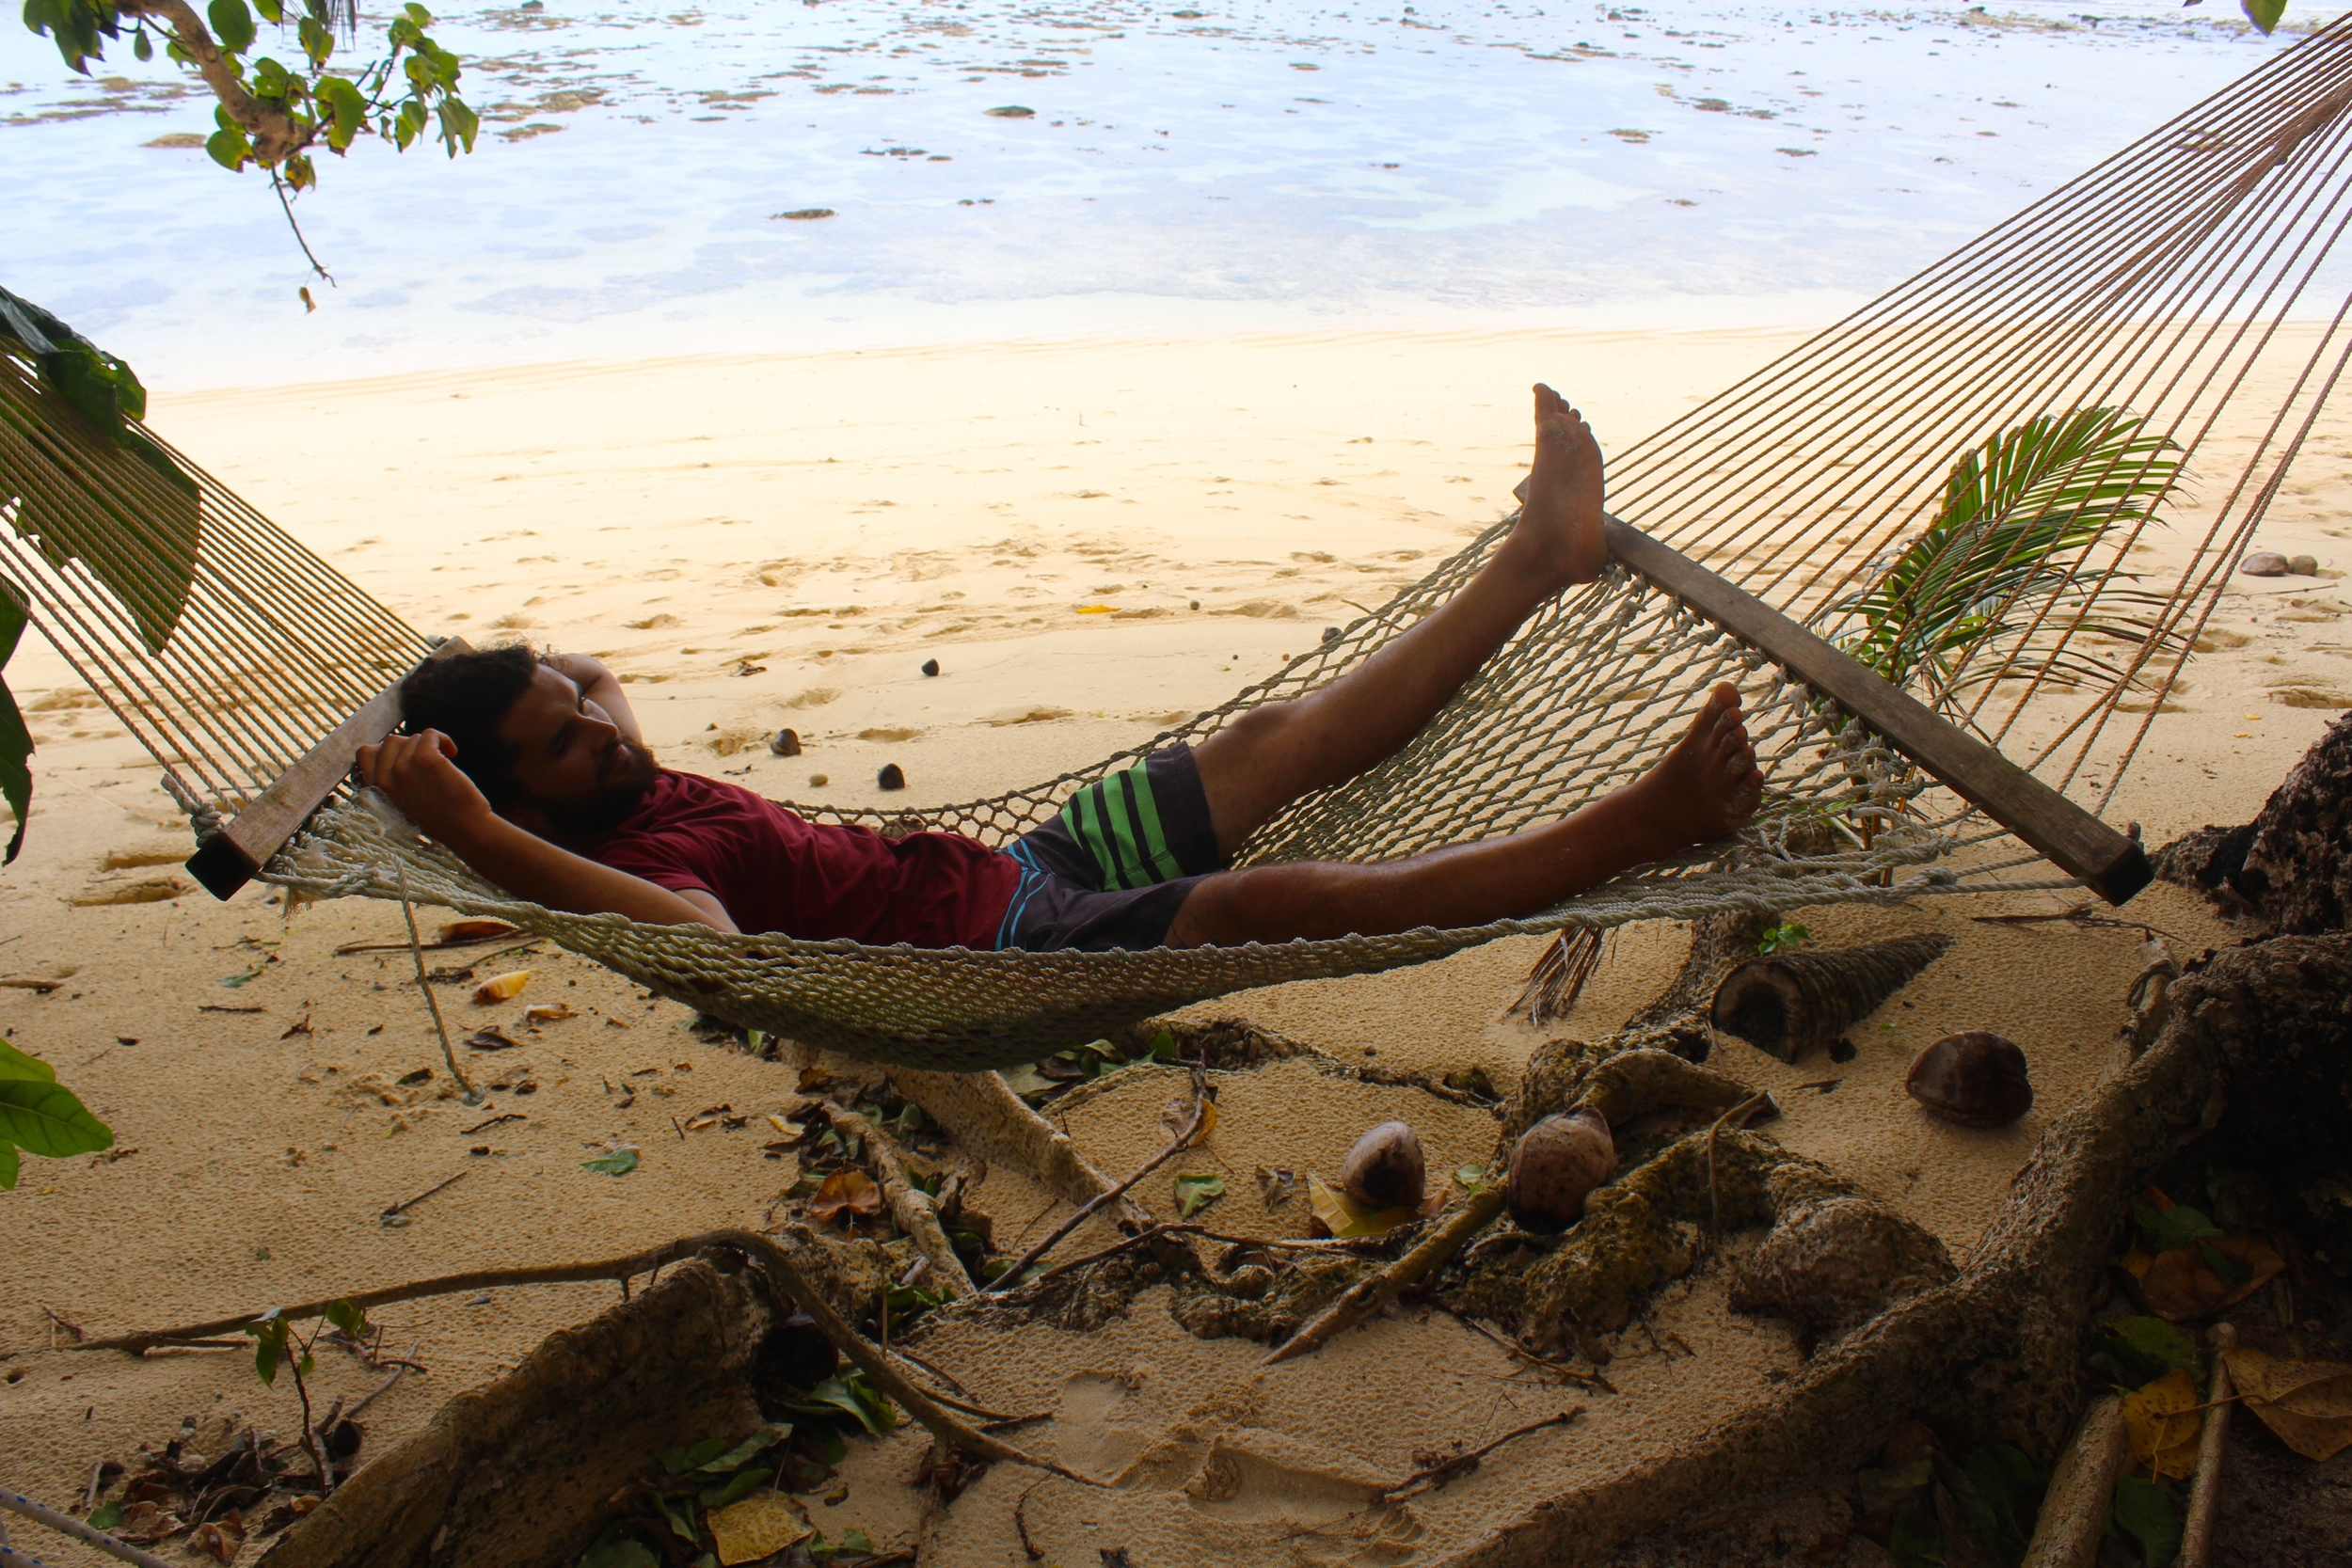 Loving the hammock